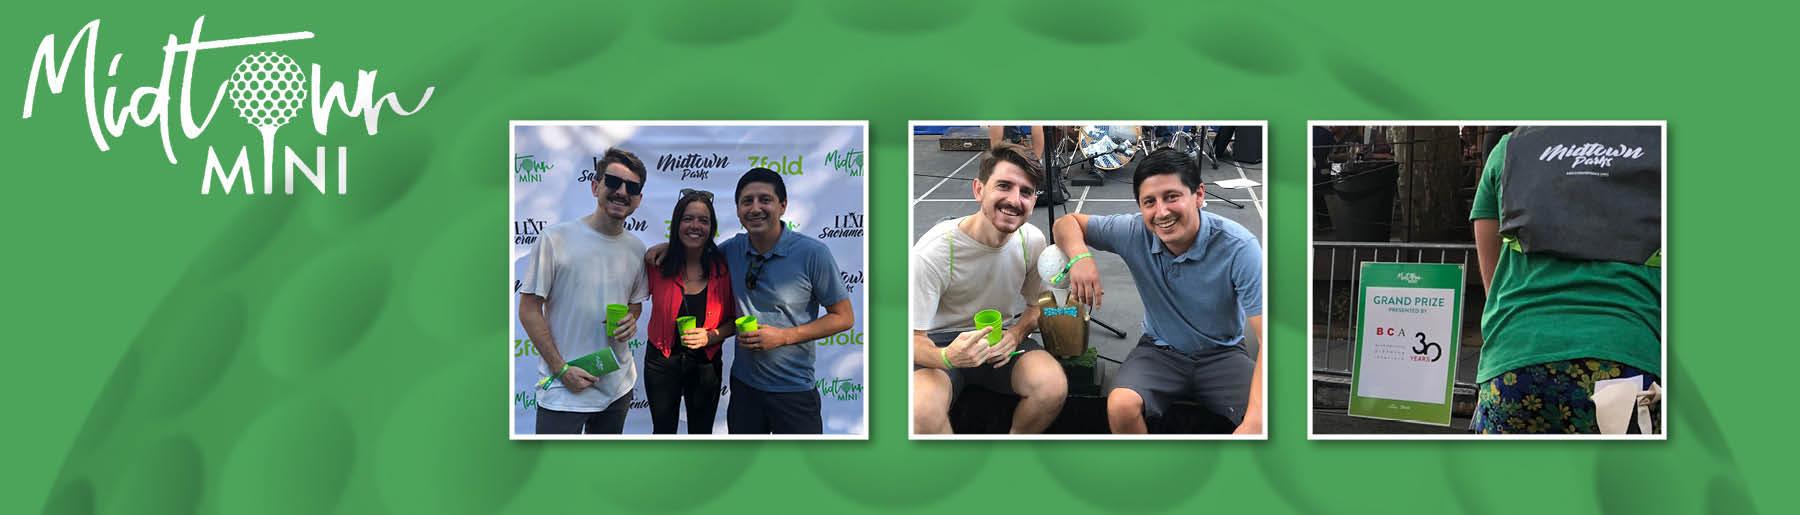 Midtown Mini Fundraiser 2019